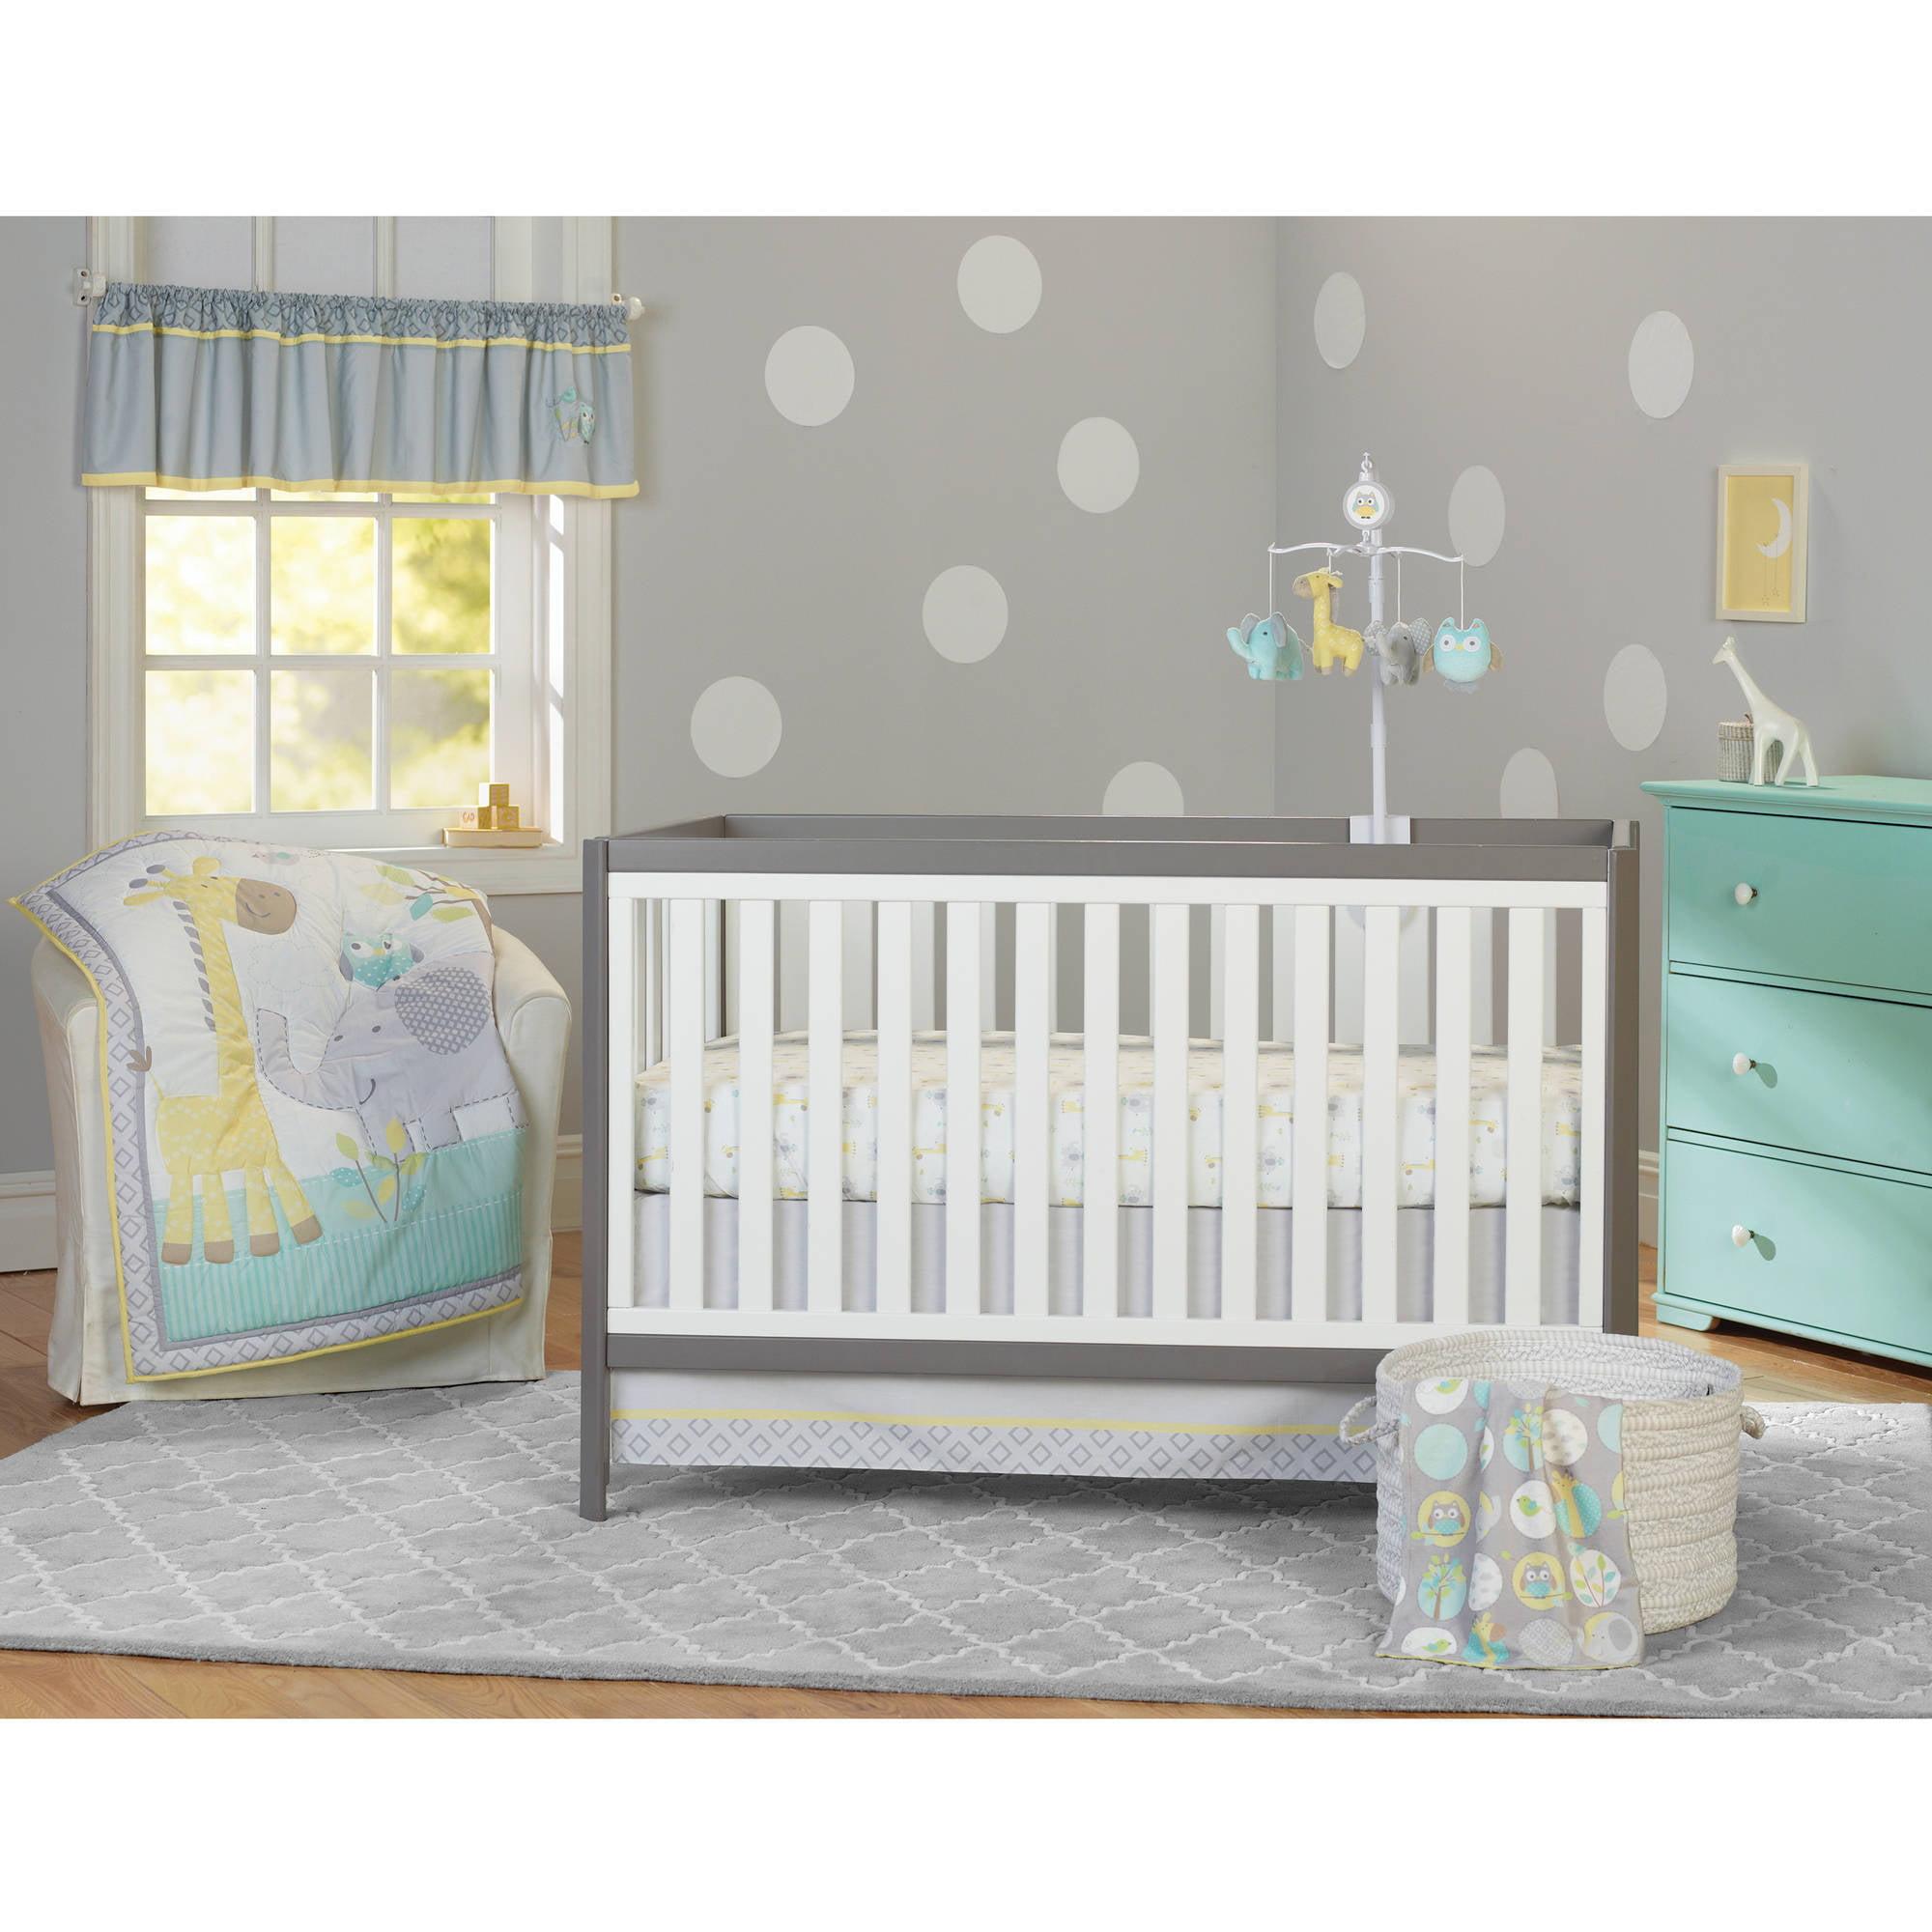 Garanimals Animal Crackers Crib Bedding Set, 3-Piece